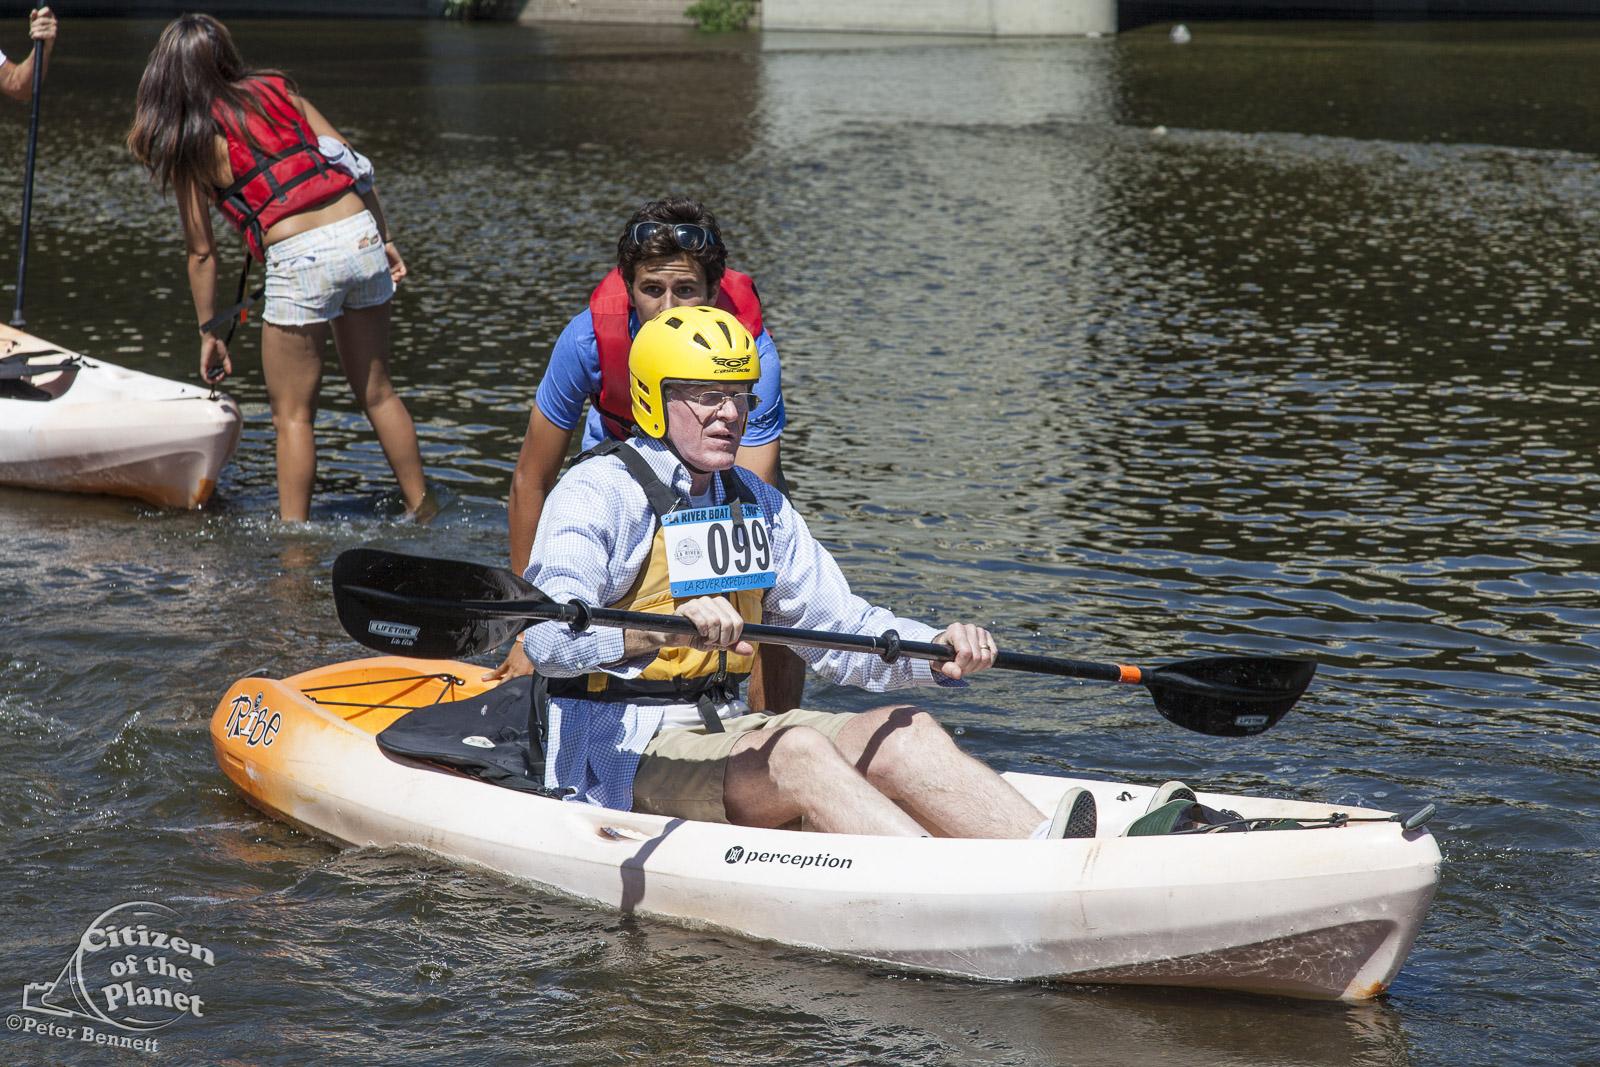 US_CA_48_3865_la_river_boat_race.jpg